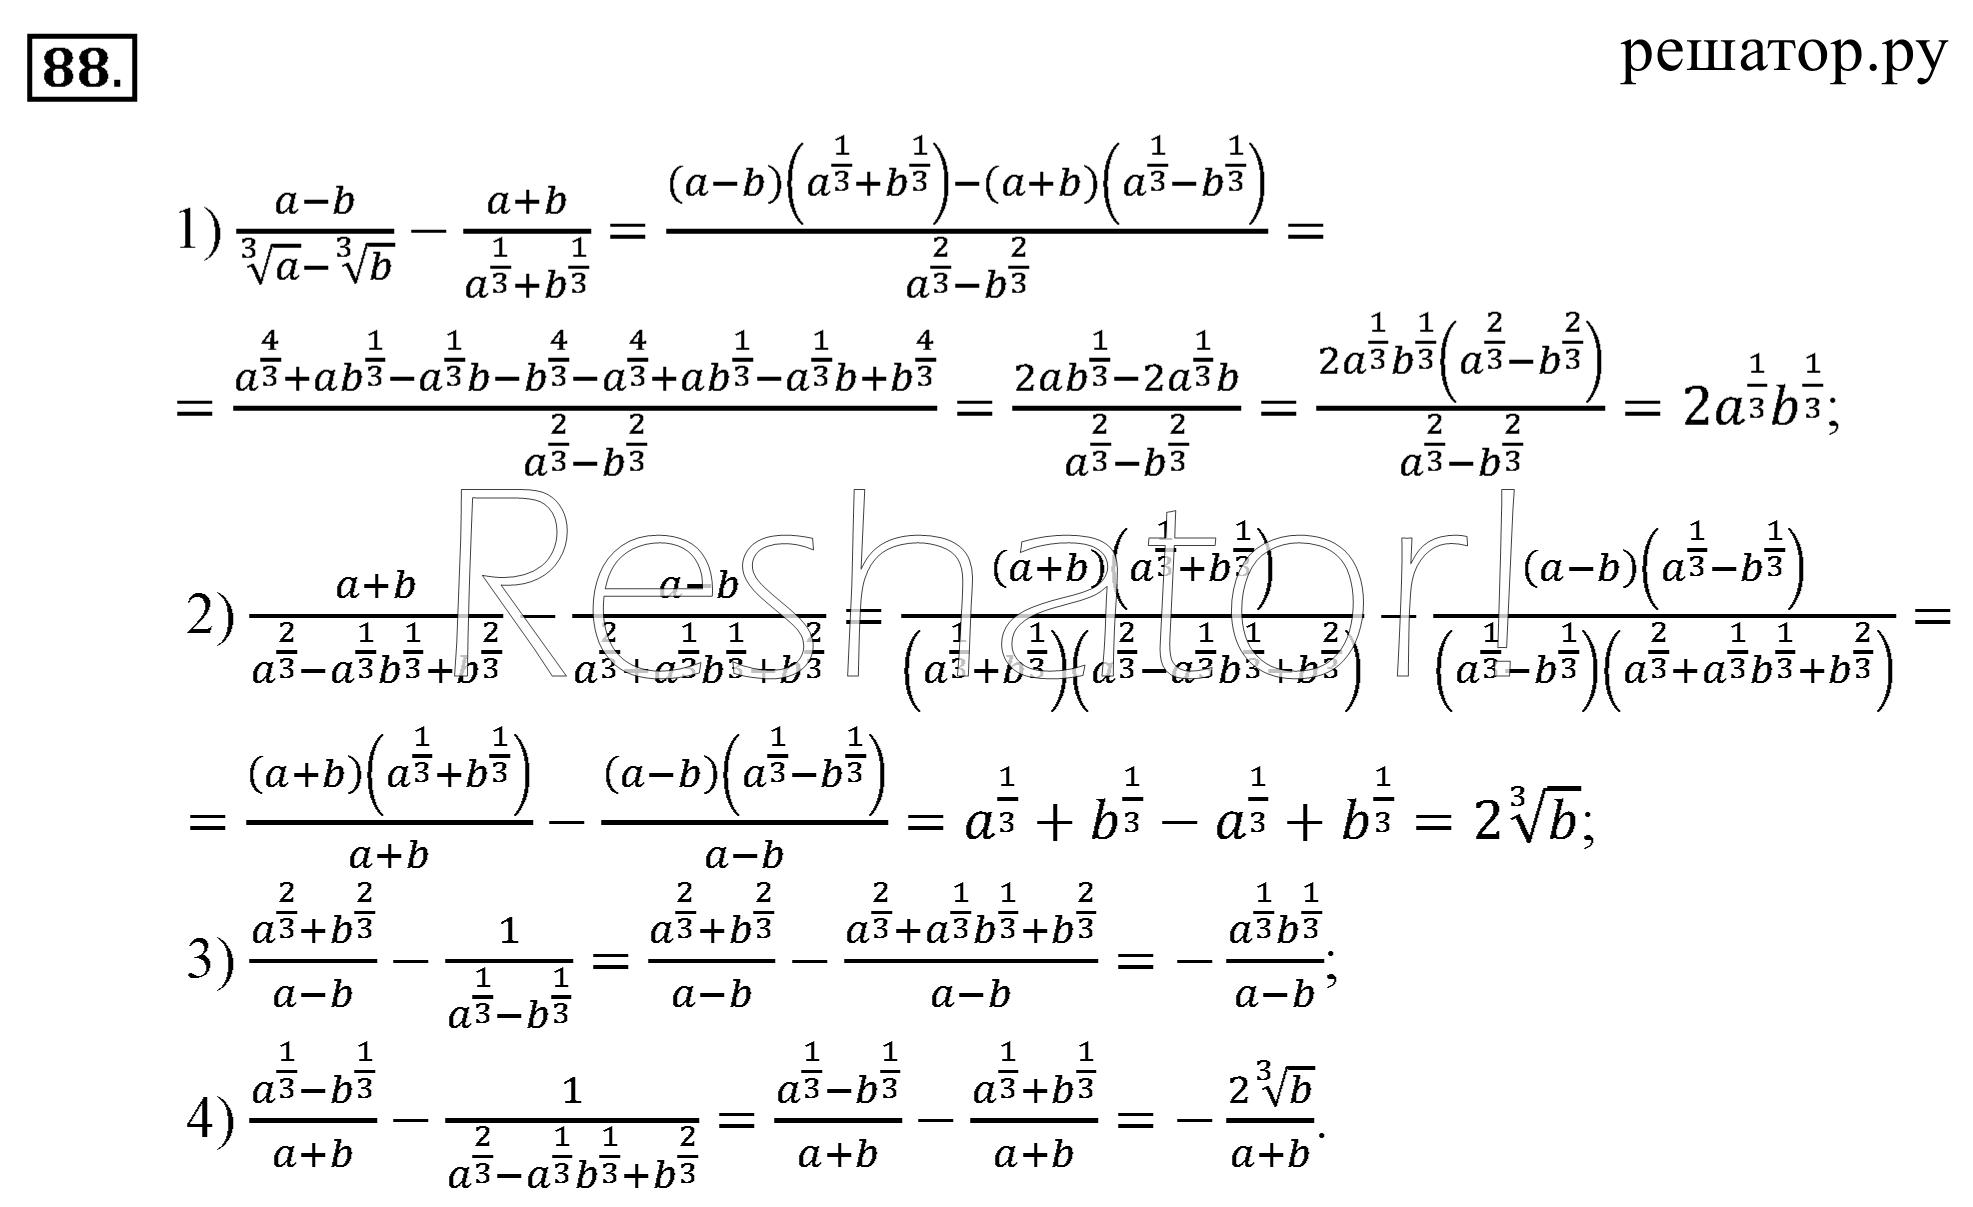 Решебник по алгебре алимов колягин 10-11 класс.